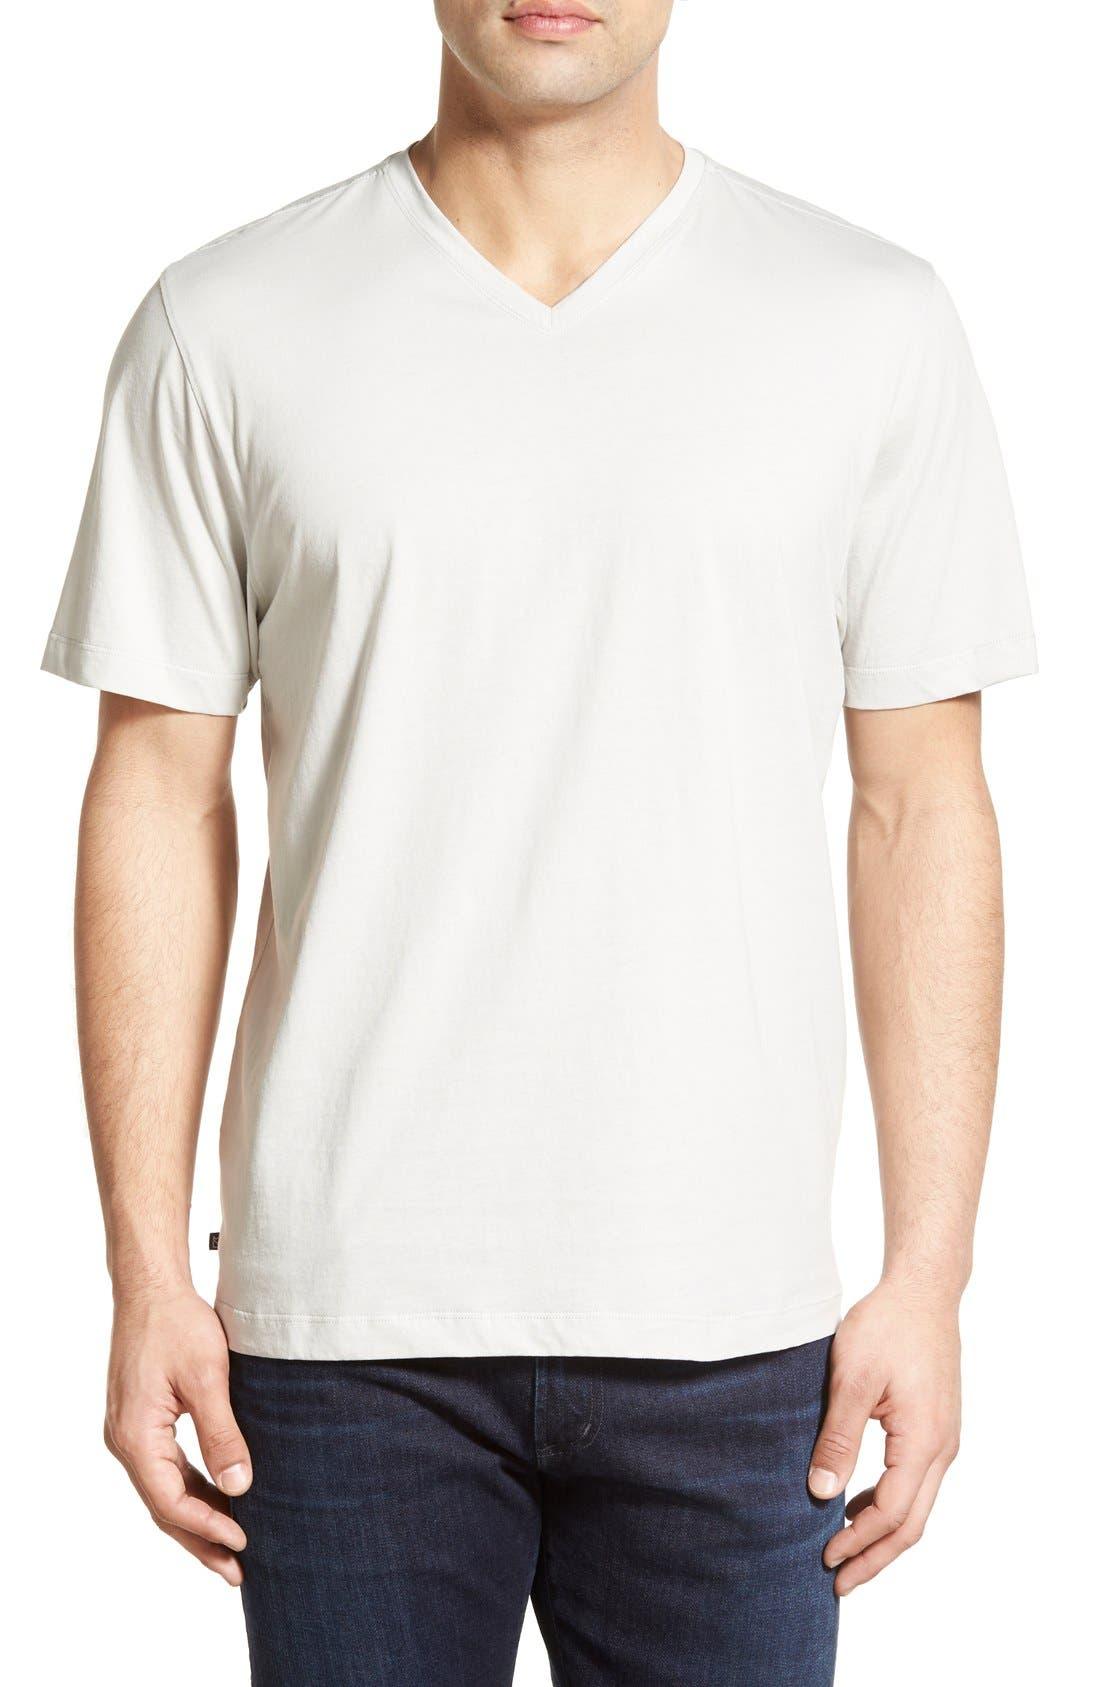 Cutter & Buck 'Sida' V-Neck T-Shirt (Big & Tall)